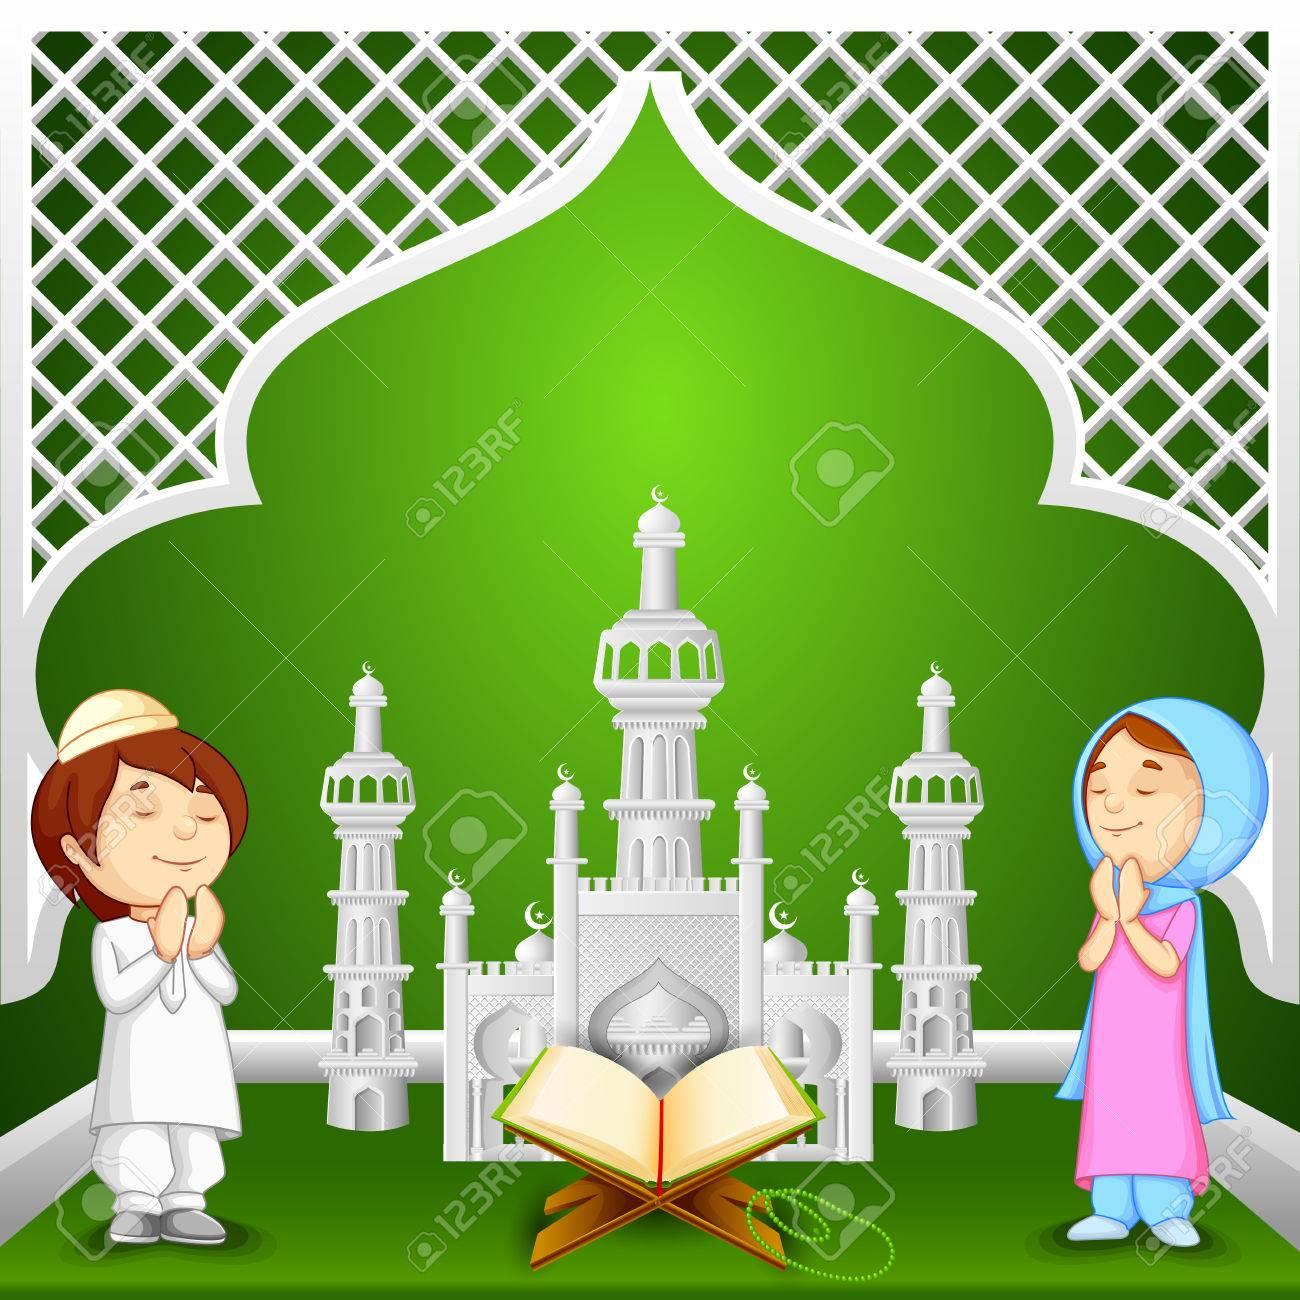 vector illustration of muslim kids offering namaaz for Eid-ul-fitr (Feast of Breaking the Fast) - 42064520